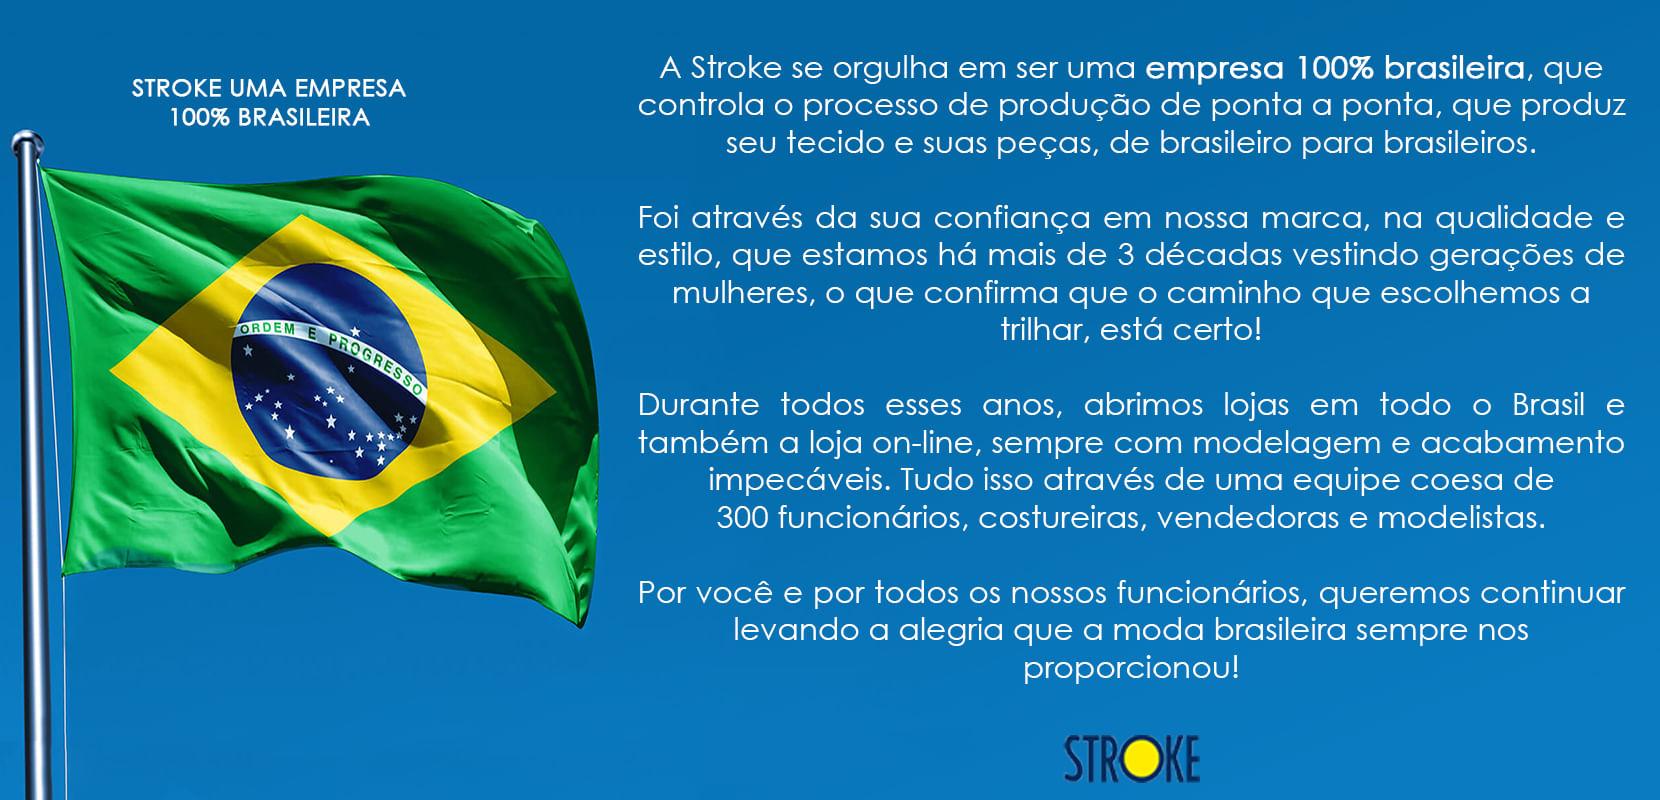 Stroke uma empresa 100% Brasileira